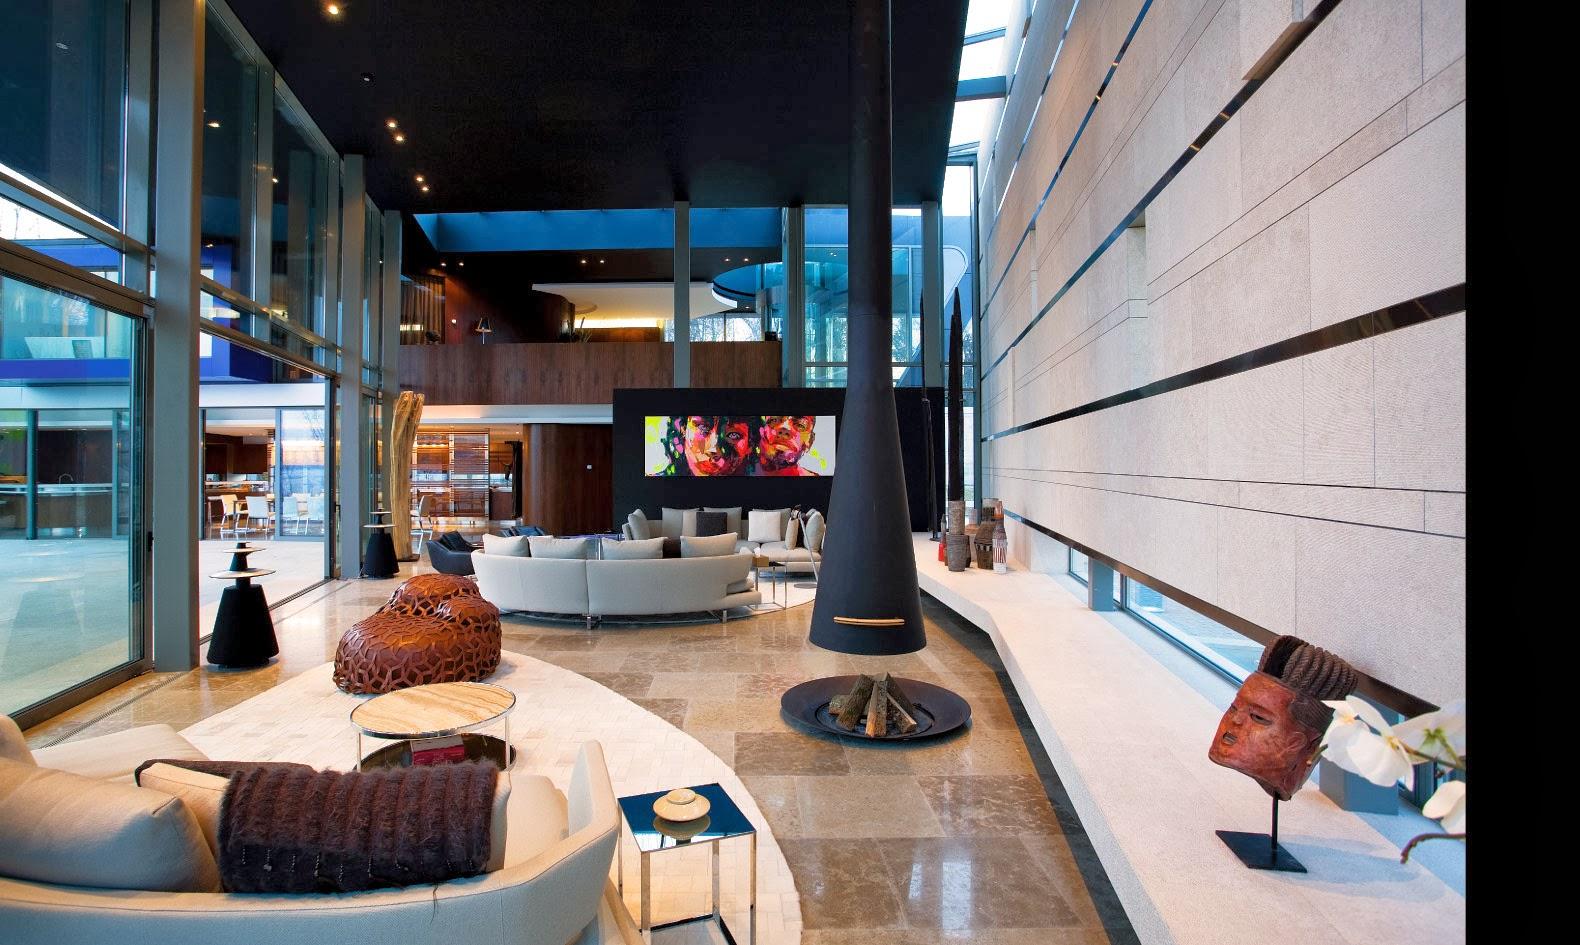 Fran Oise Nielly Sow Maison Ultra Moderne Suisse Gen Ve